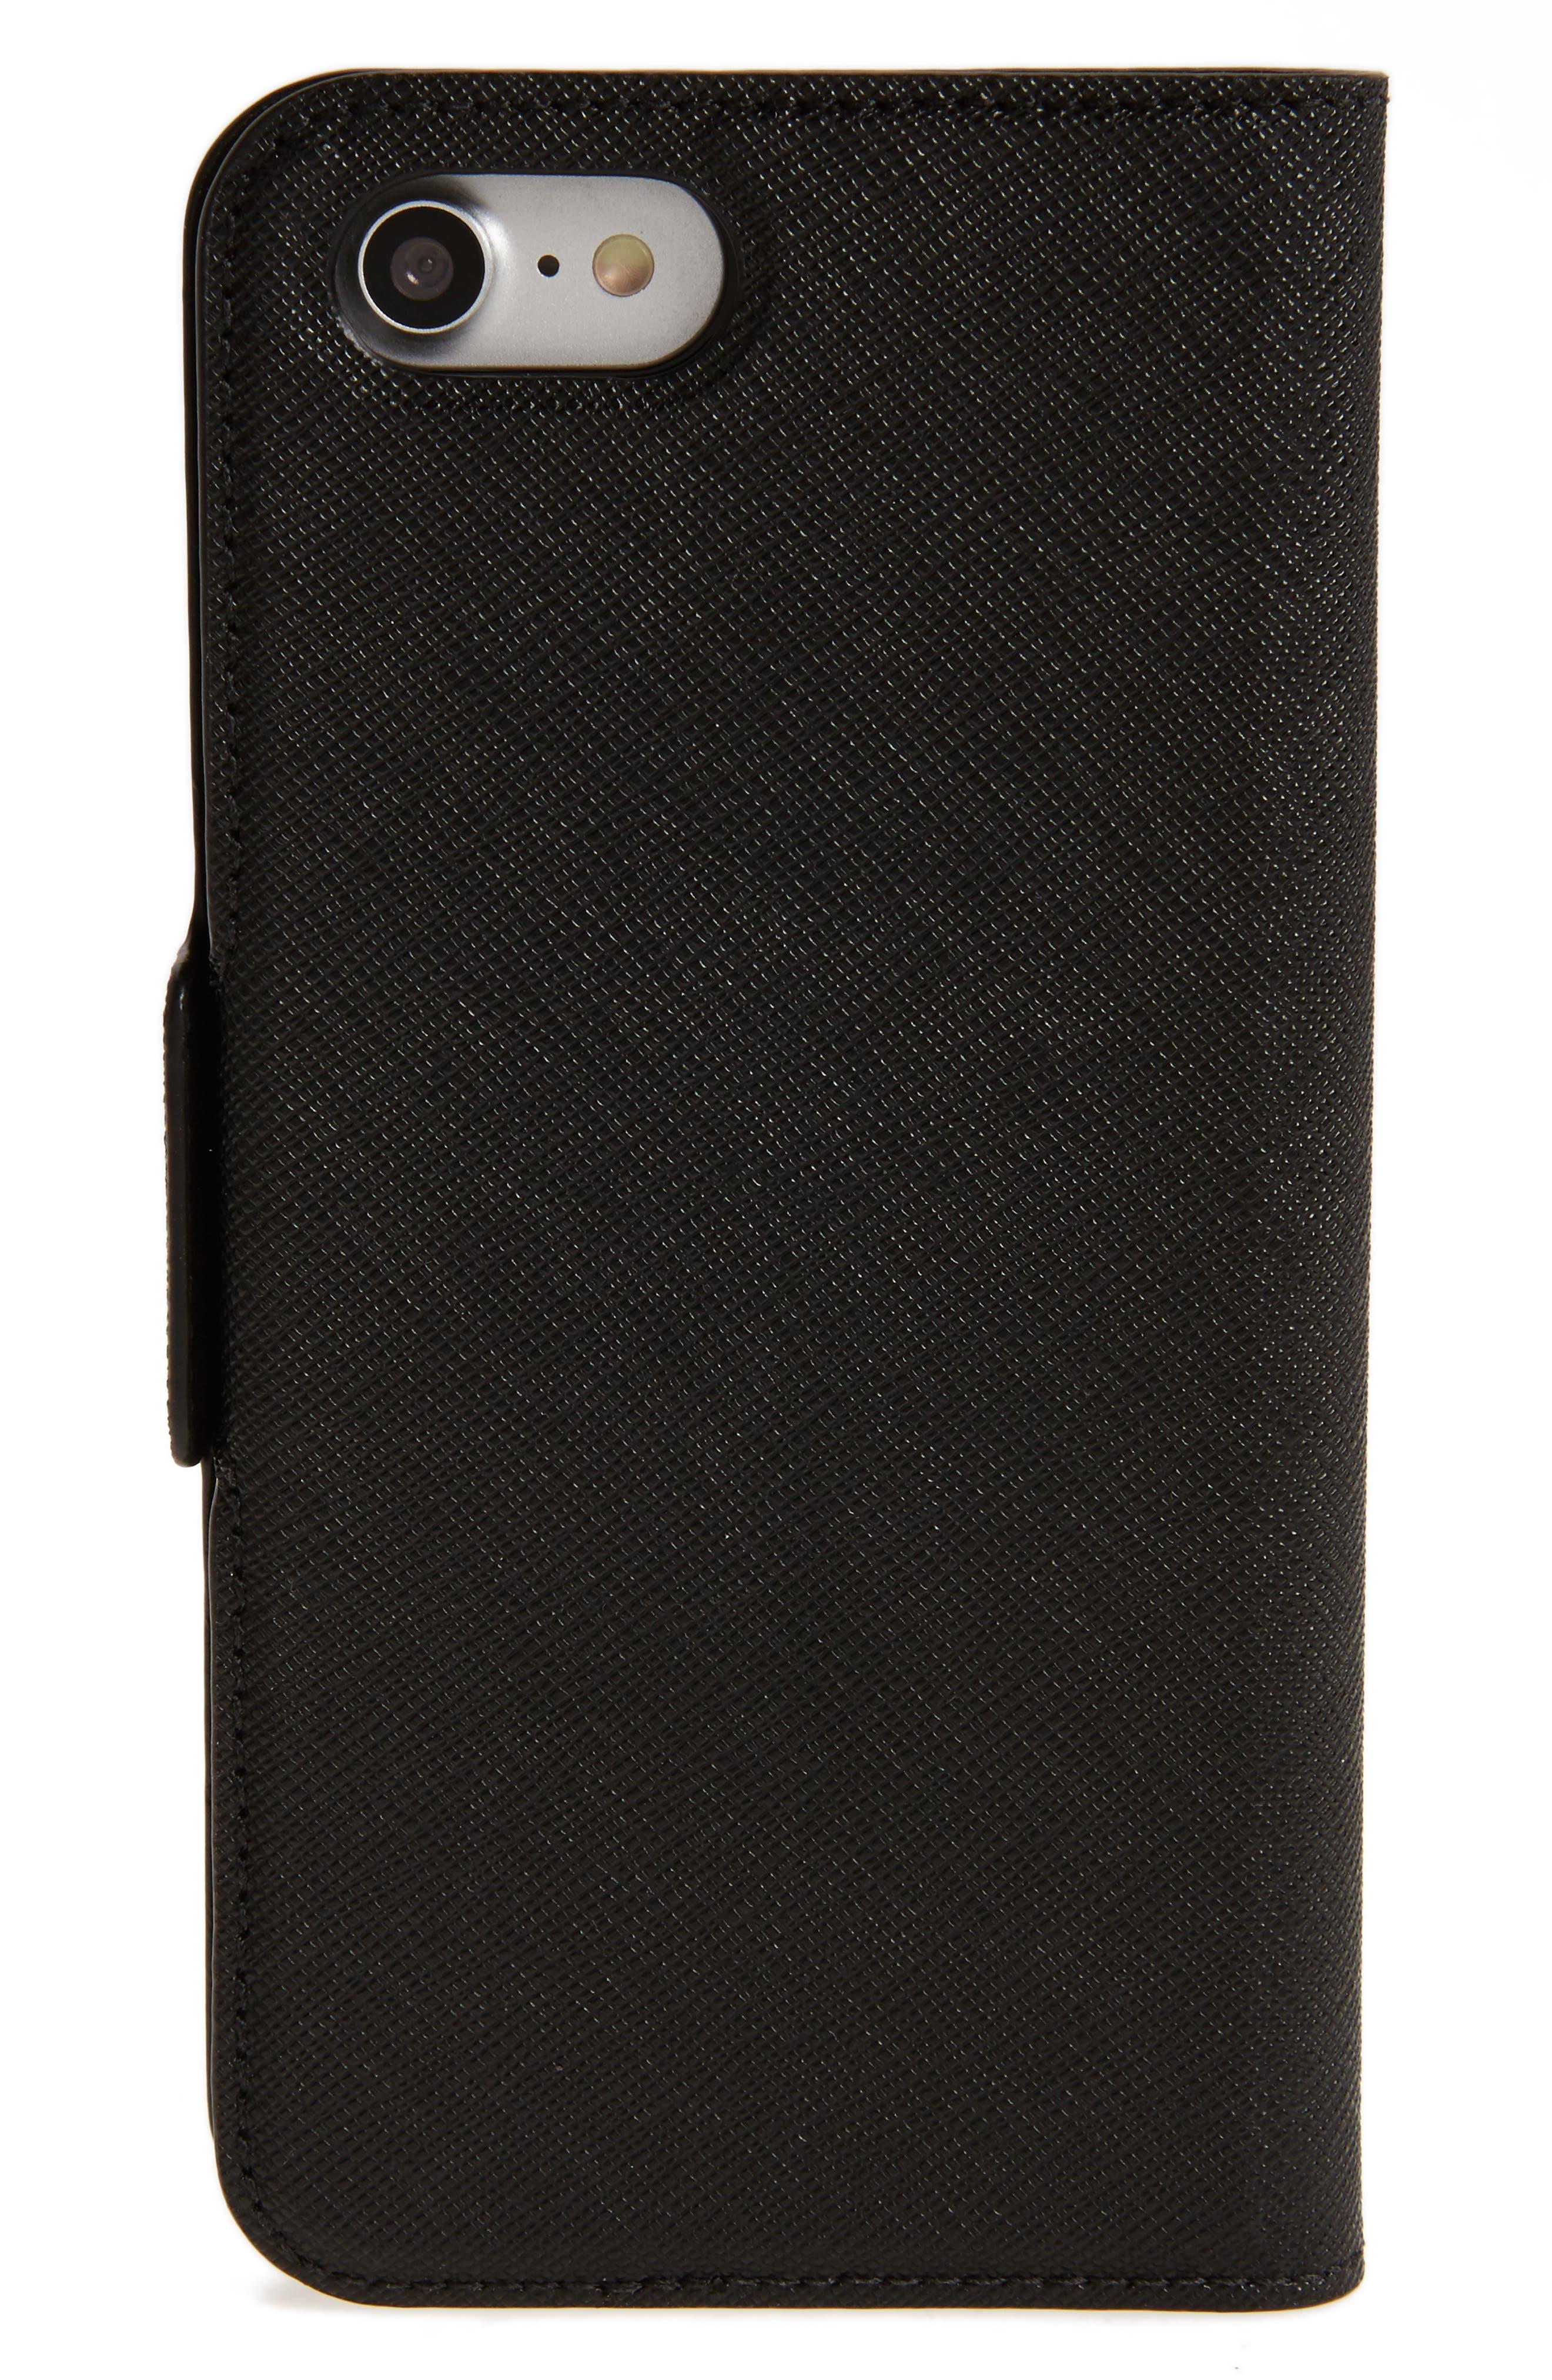 antoine appliqué leather iPhone 7/8 folio case,                             Alternate thumbnail 2, color,                             002